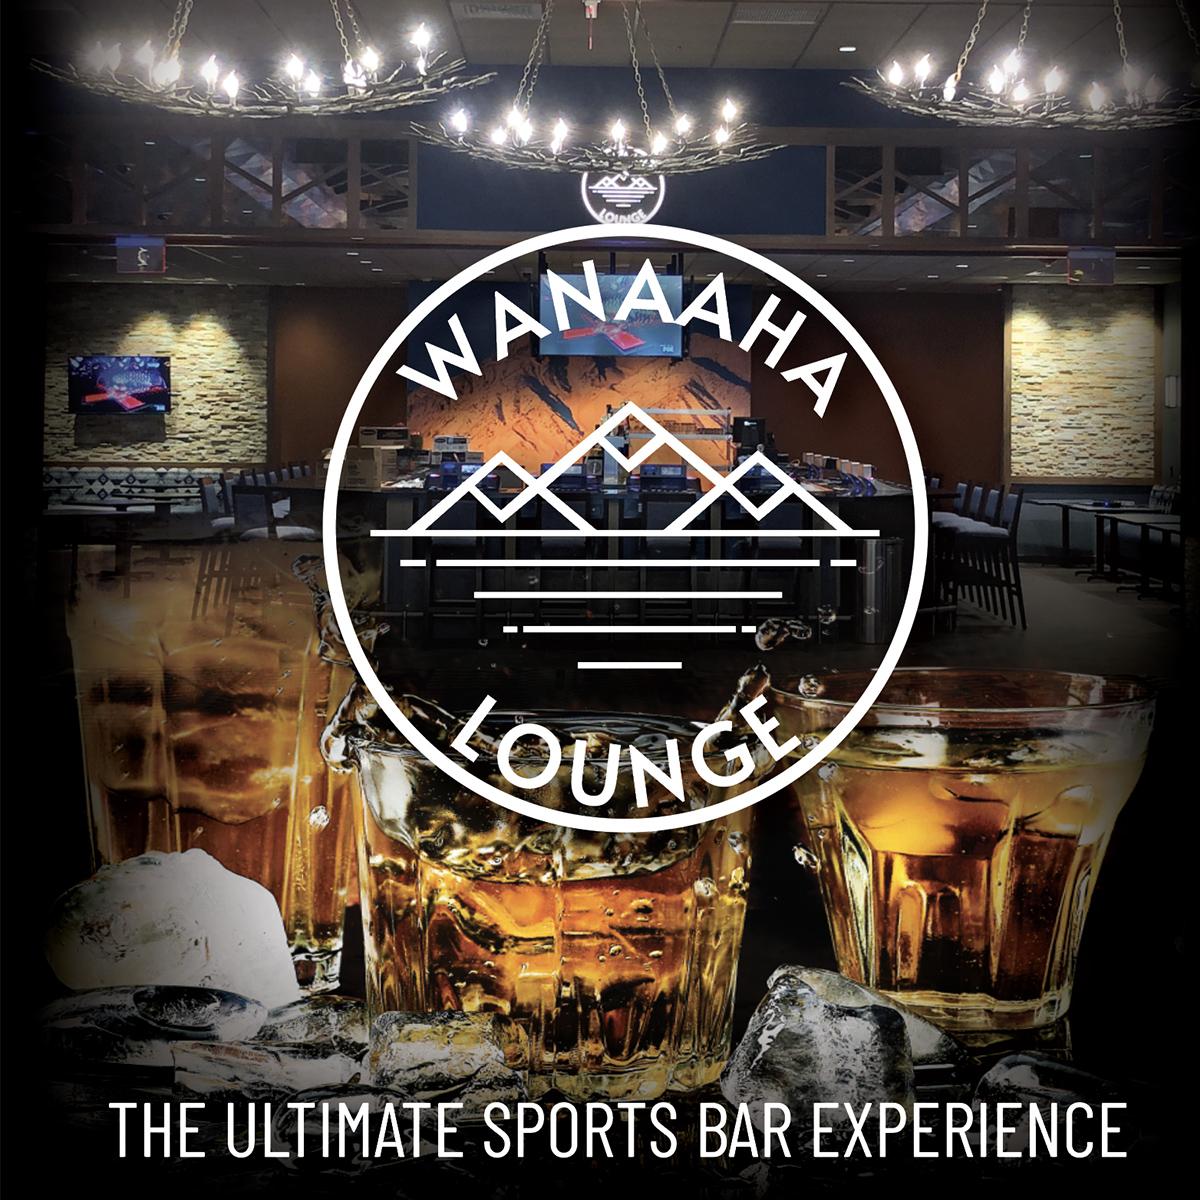 wanaaha lounge